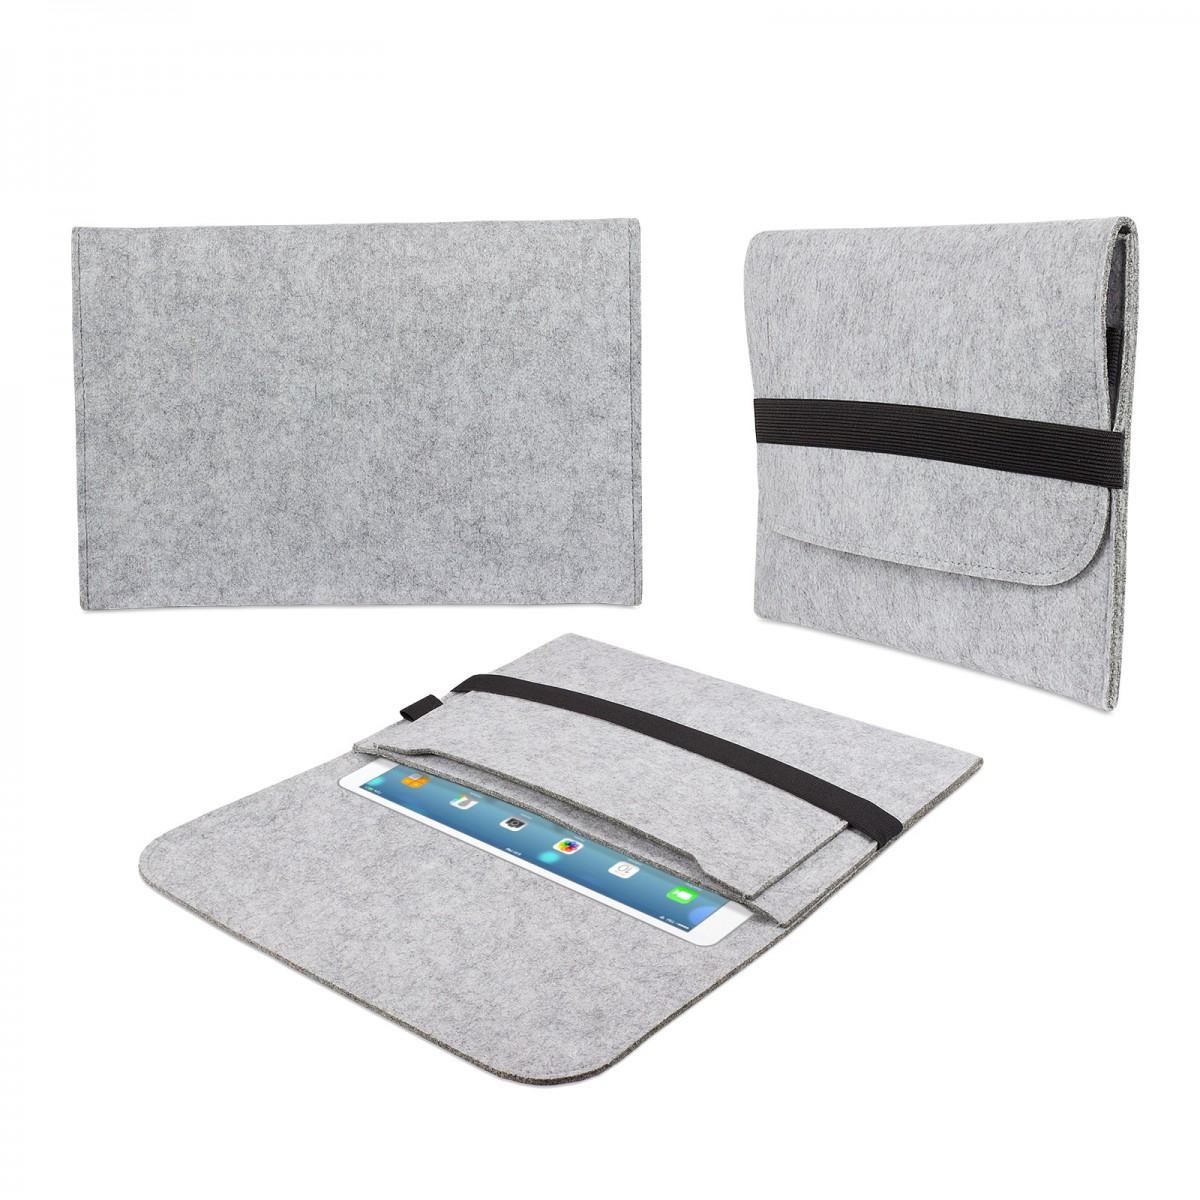 efabrik apple ipad pro tasche 12 9 zoll schutz h lle laptop sleeve filz ebay. Black Bedroom Furniture Sets. Home Design Ideas